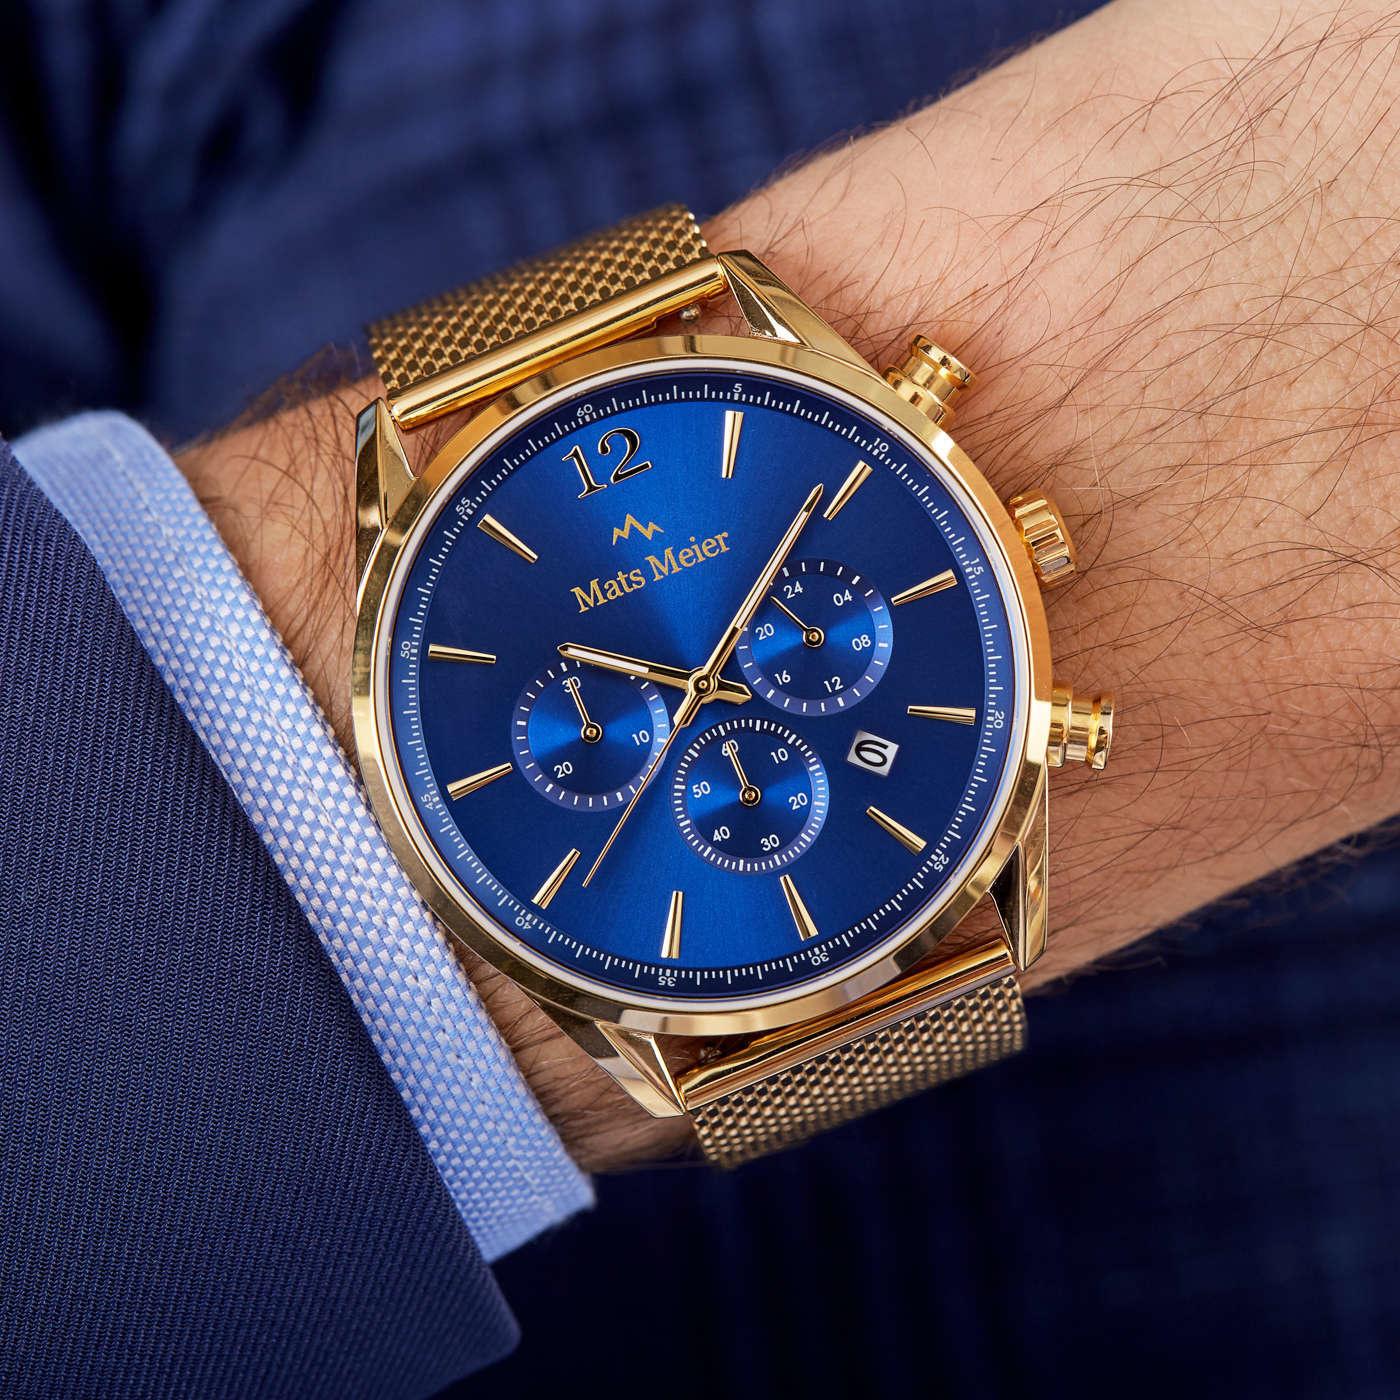 Mats Meier Grand Cornier chronograaf herenhorloge blauw / goudkleurig mesh